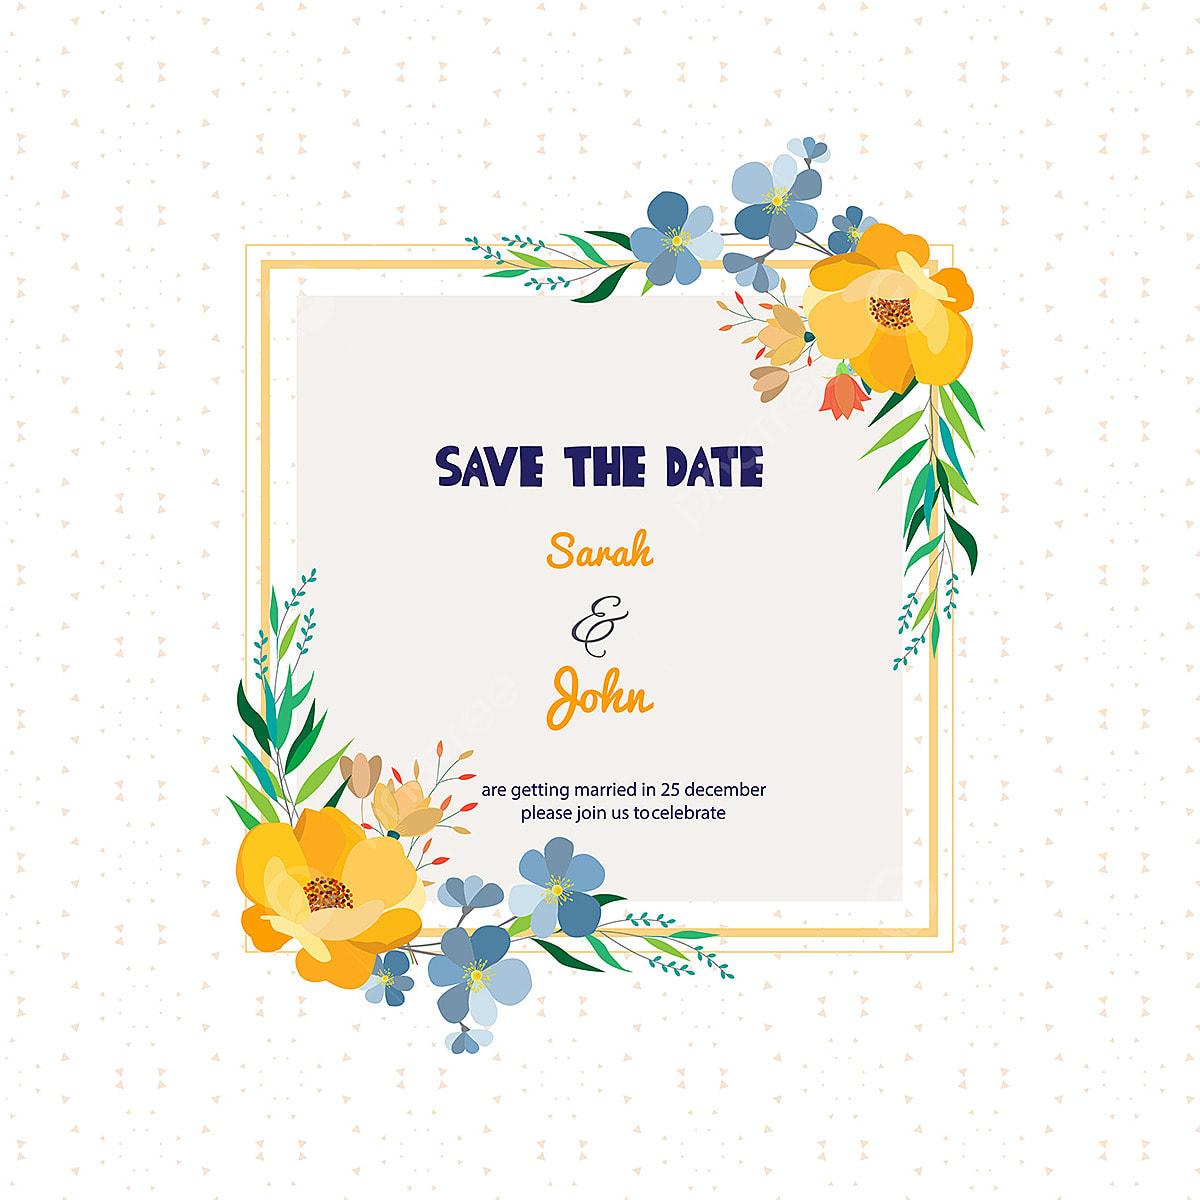 wedding invitation card wedding card weddinginvitation